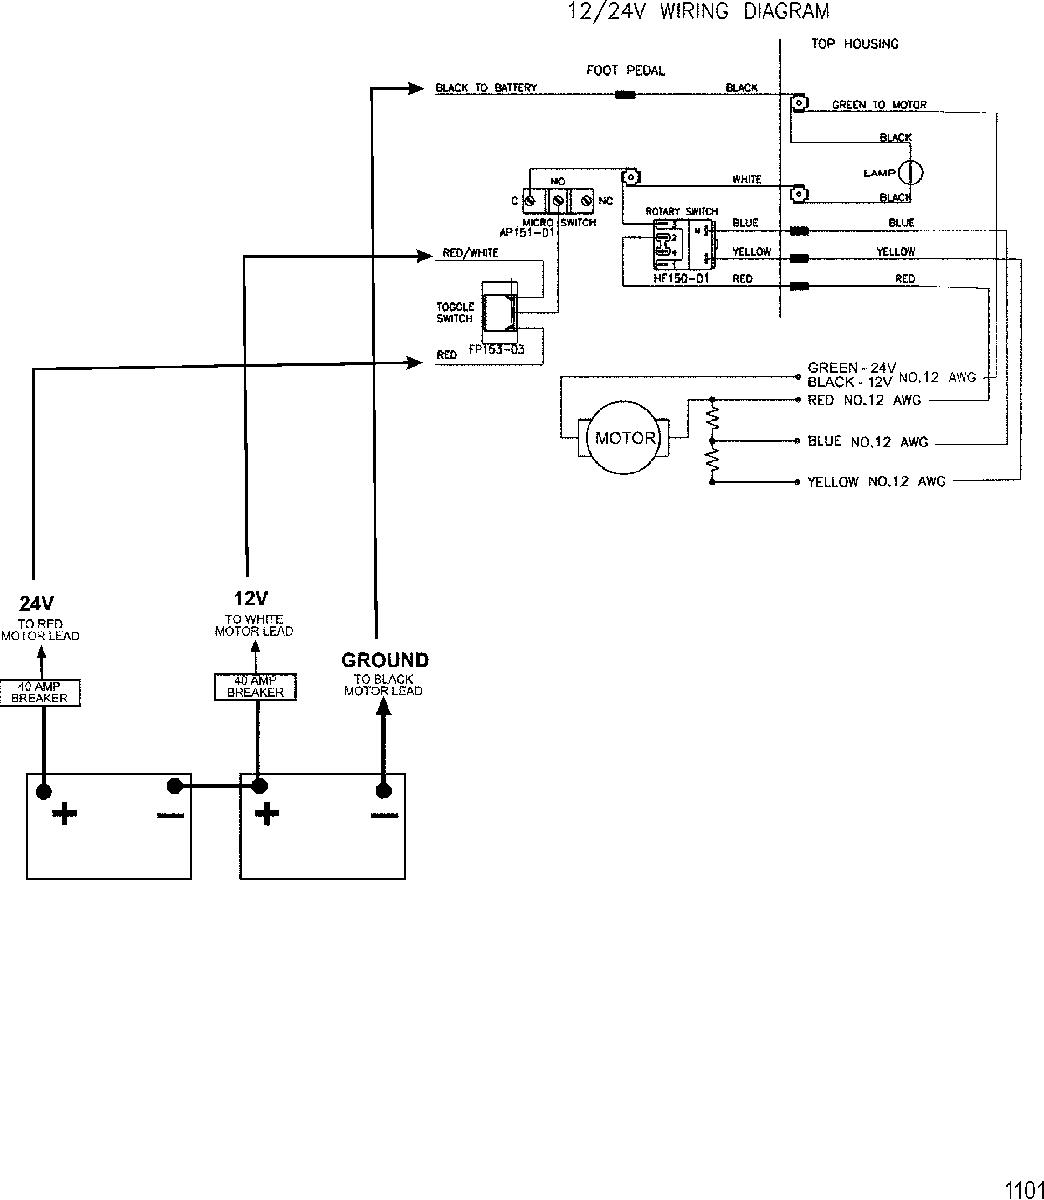 24V Trolling Motor Wiring Diagram | Wiring Diagram - Trolling Motor Wiring Diagram